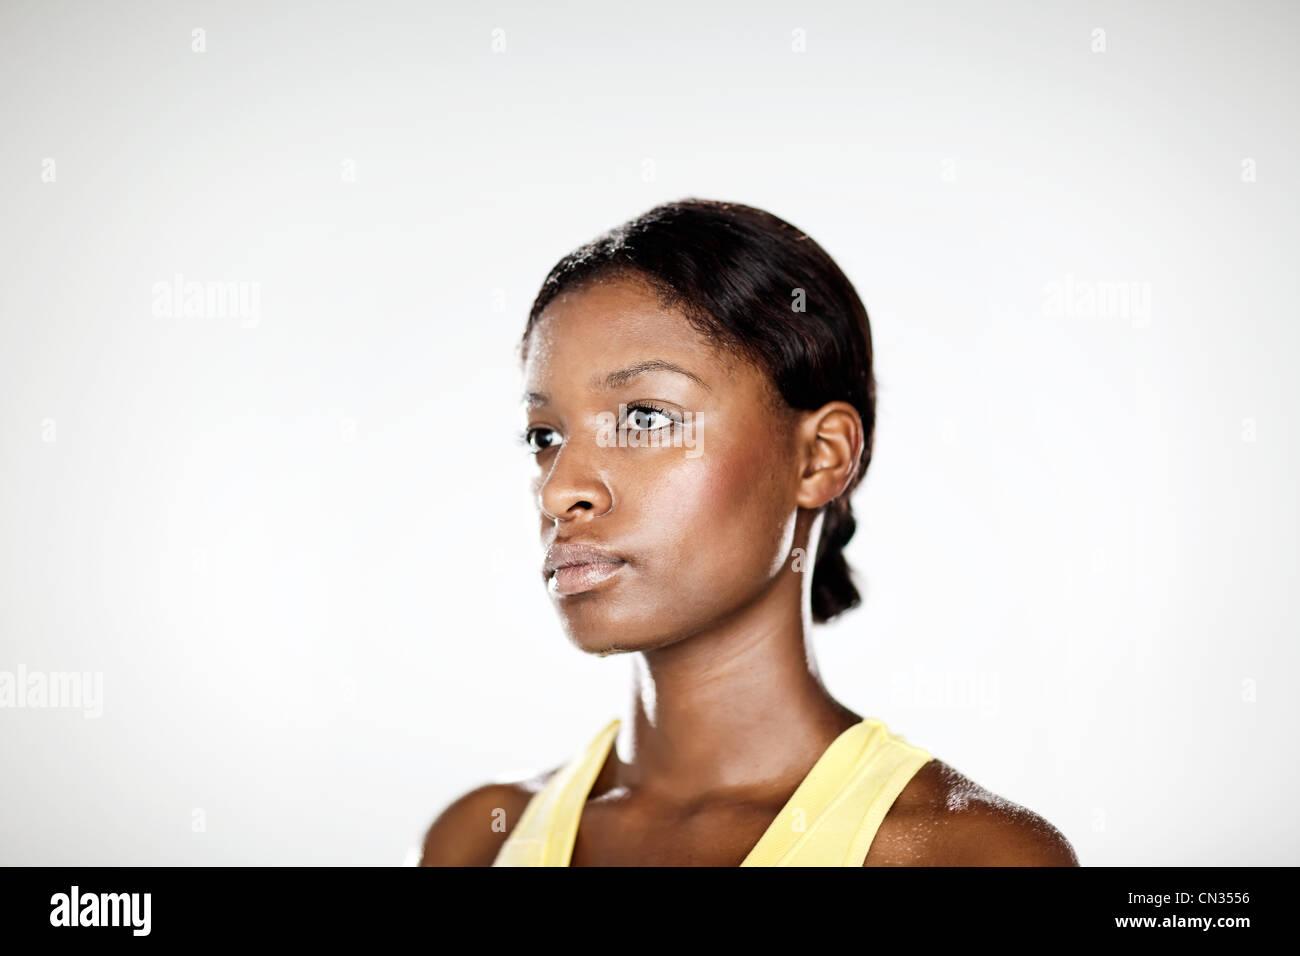 Athlète féminin, portrait Photo Stock